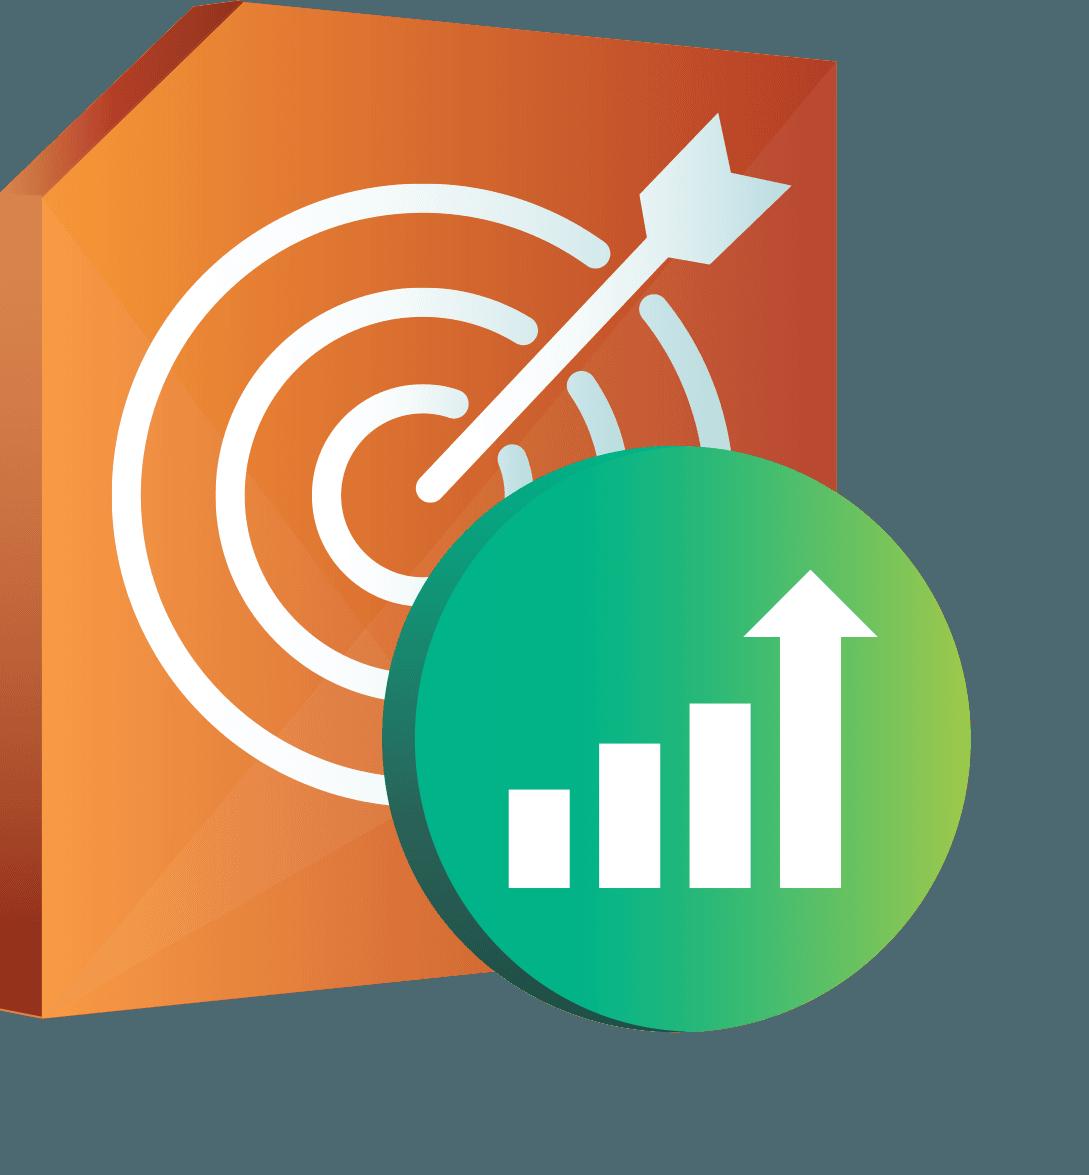 Xtb model portfolios australian. Finance clipart fixed income